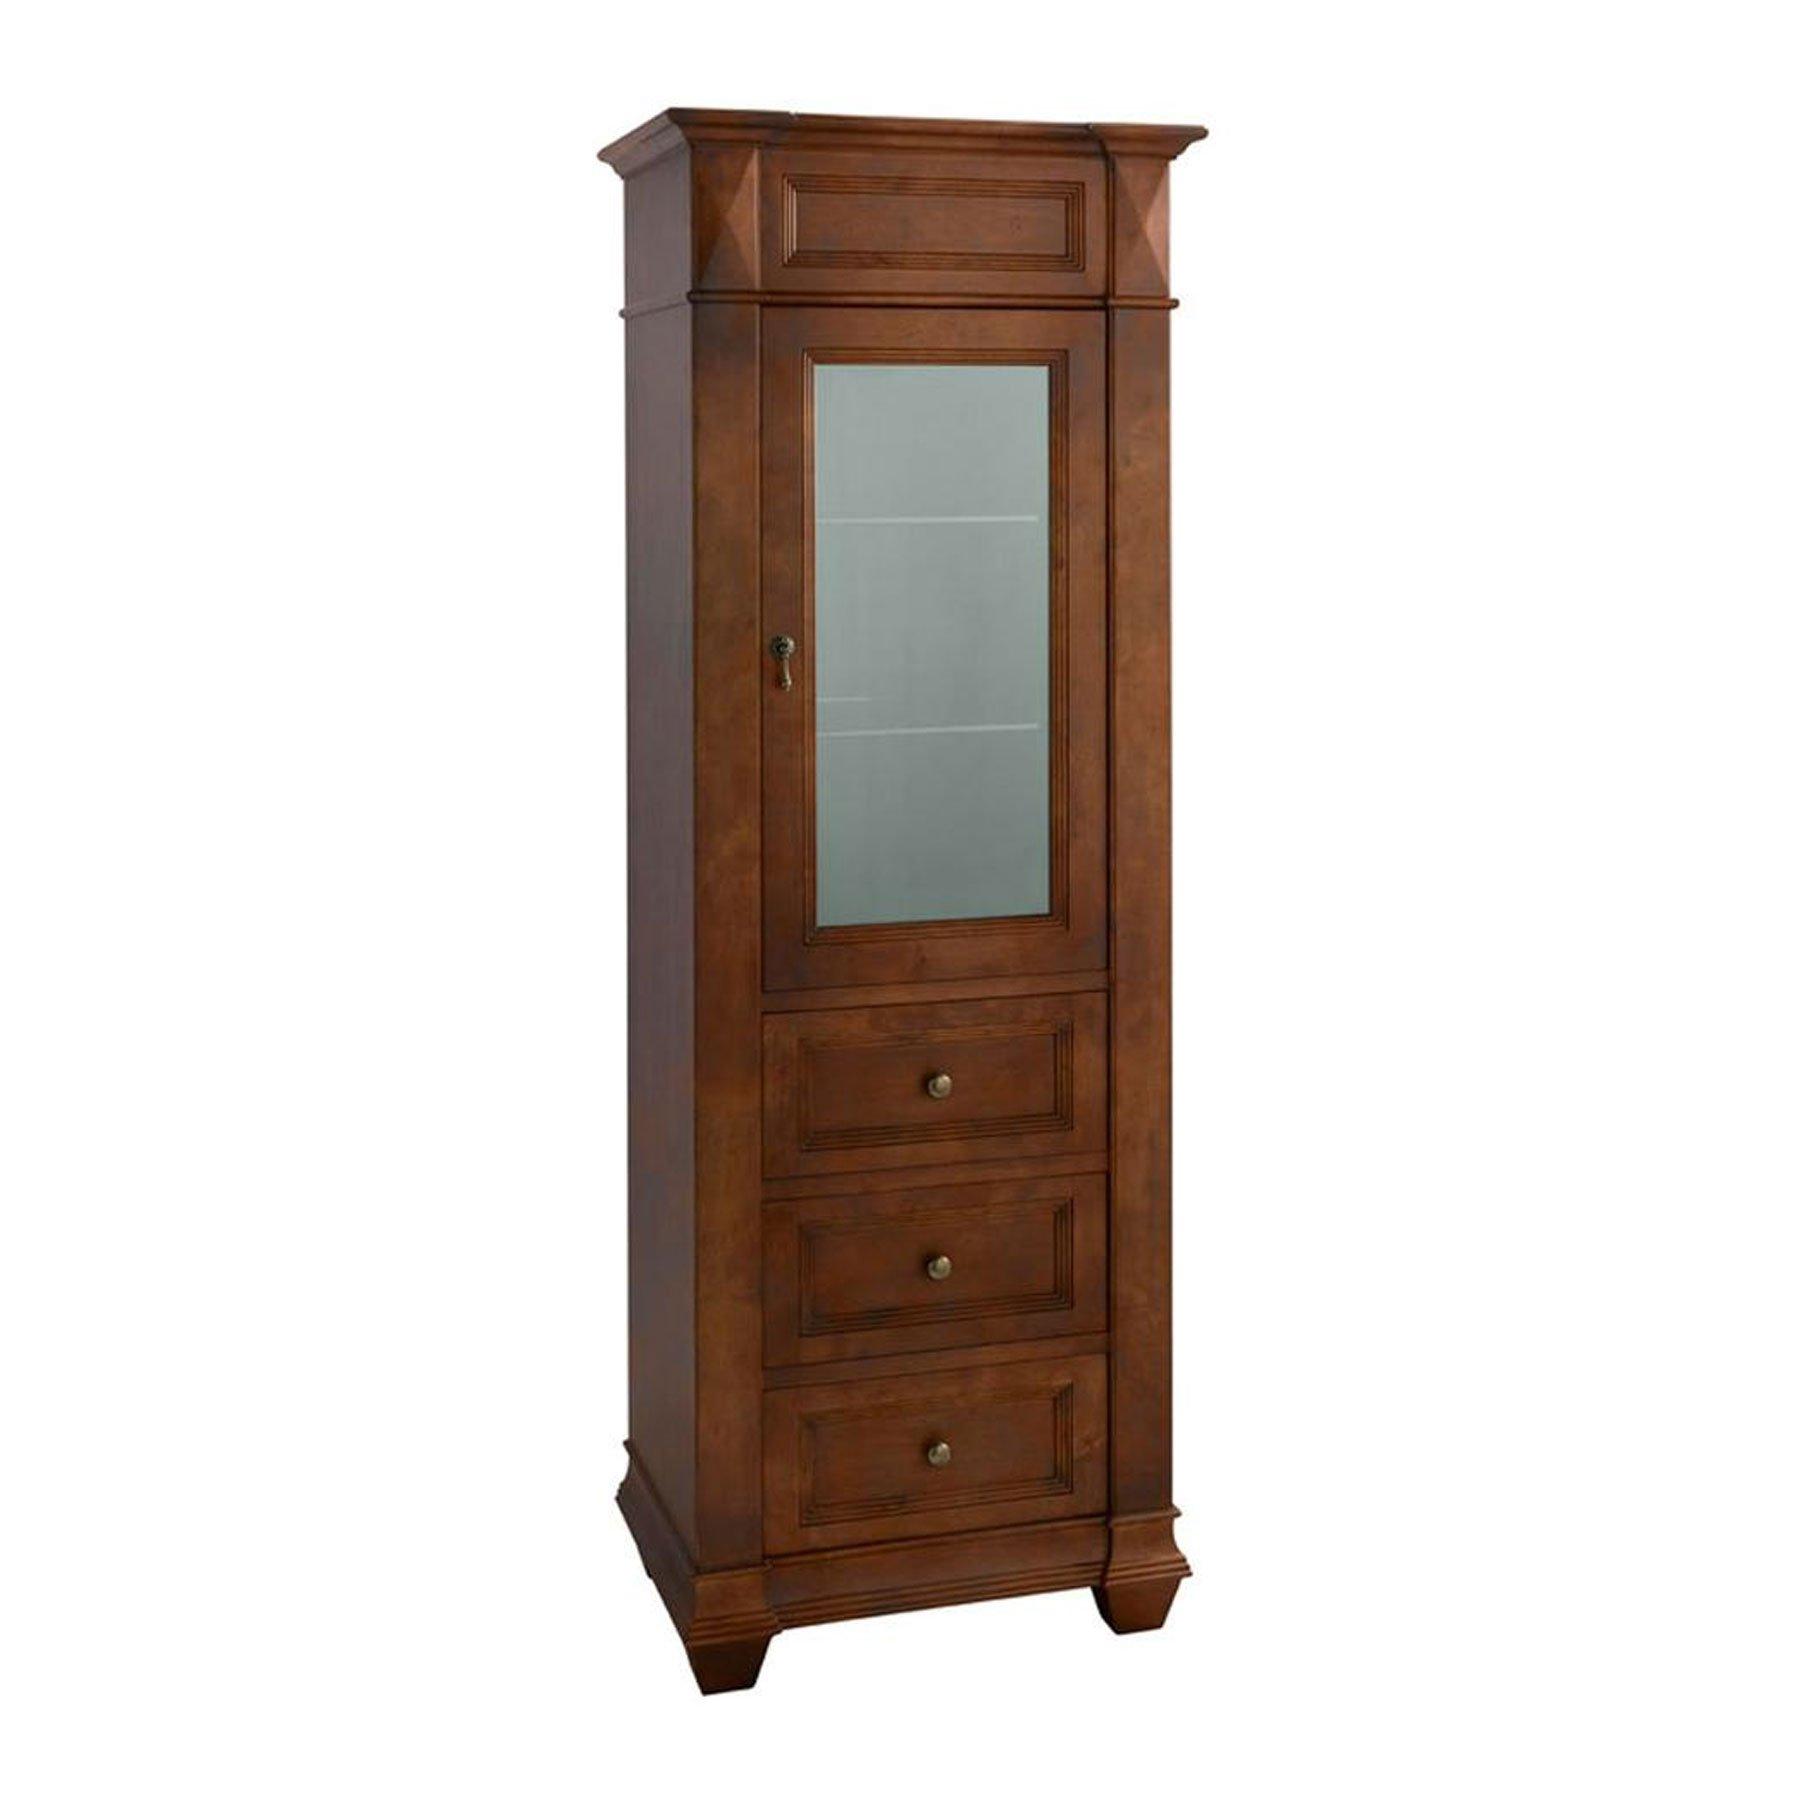 MAYKKE 30'' x 72'' Tall Juliet Curio Cabinet Display Case | Traditional Frosted Glass Window Bathroom Storage Organizer | Rich, Hardwood Construction | Cherry Americana, YSA2040101